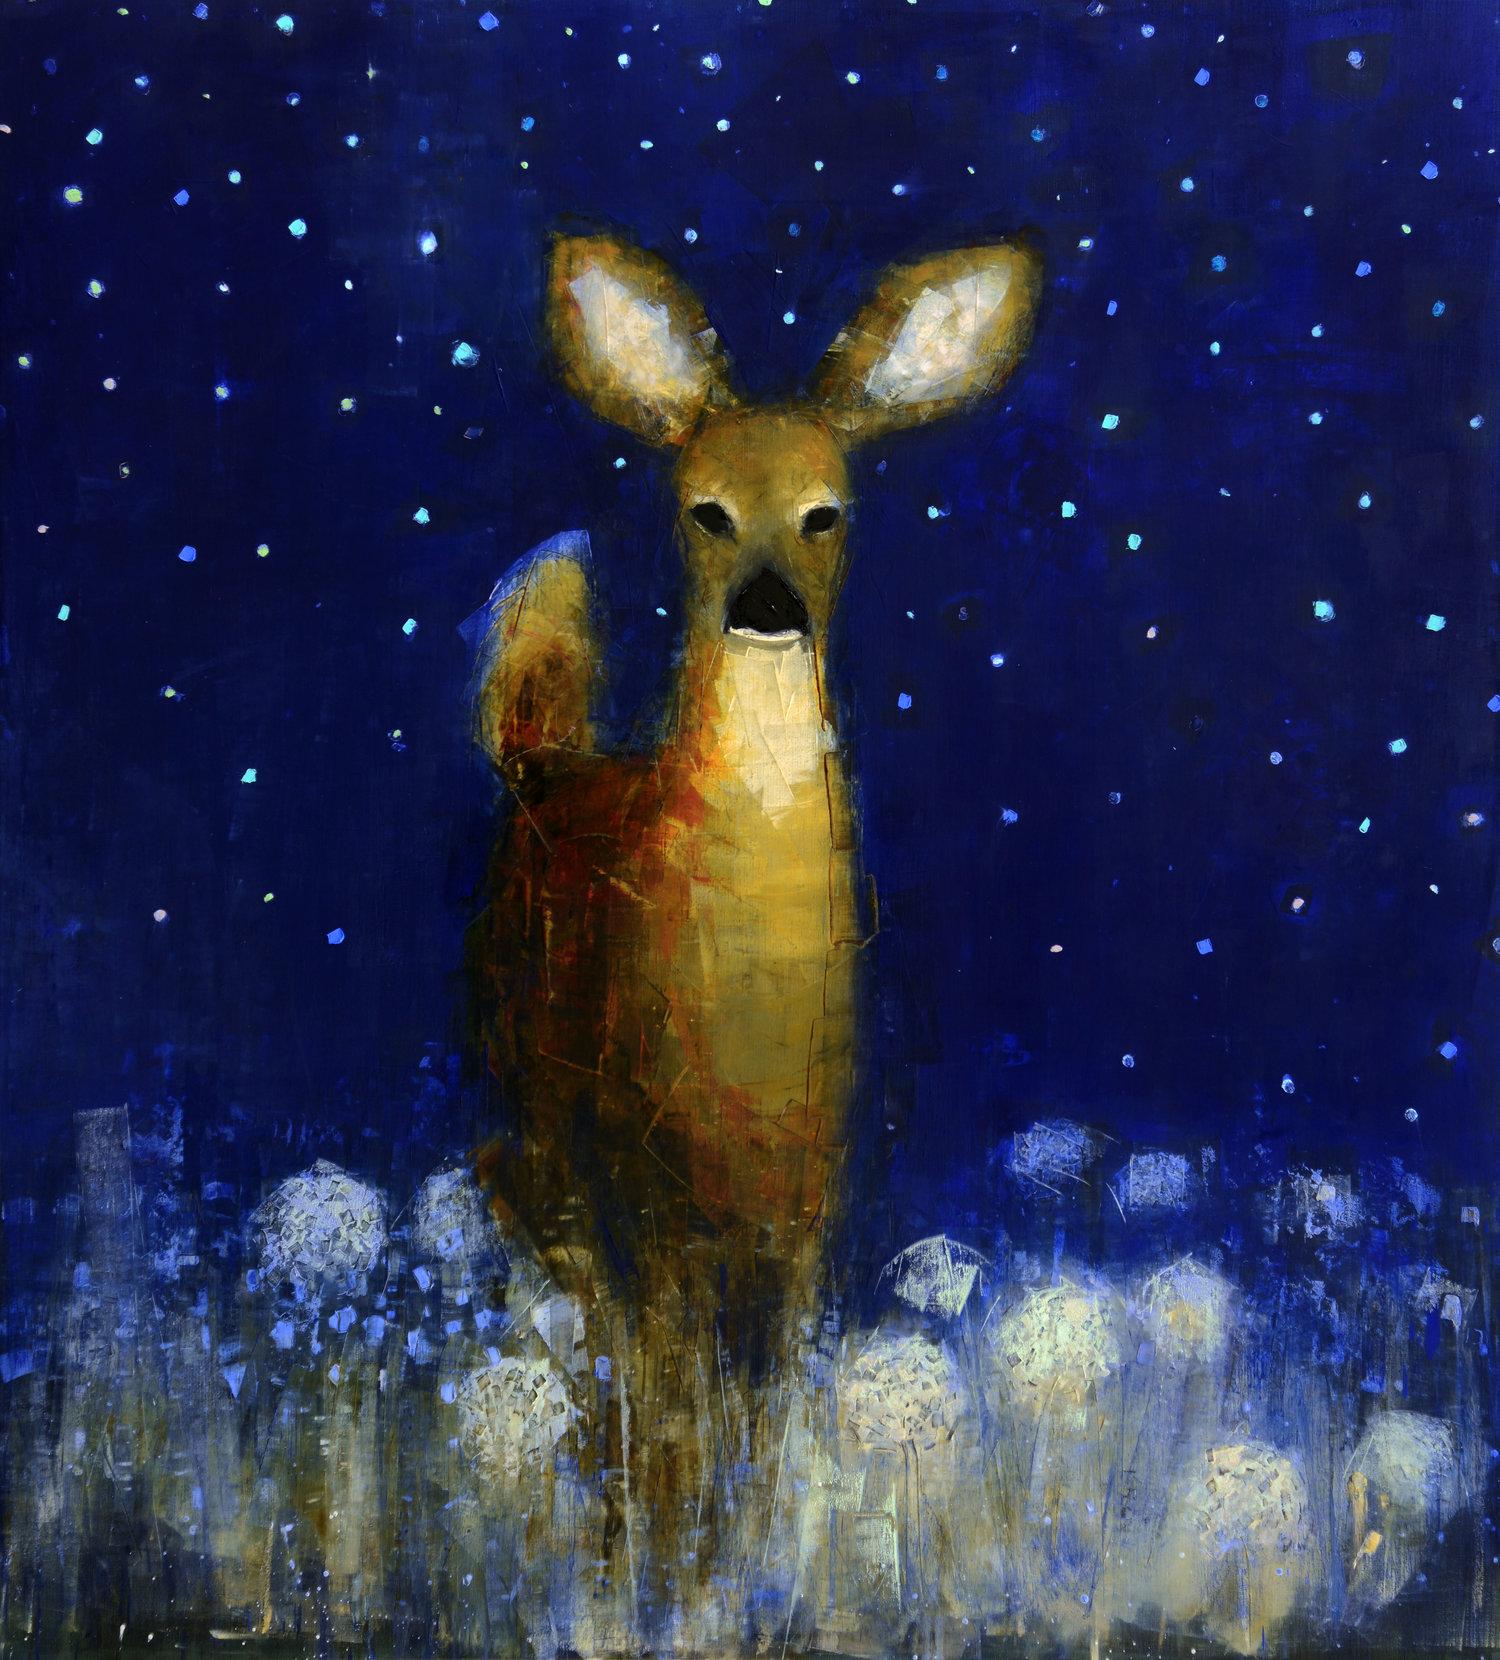 Doe+(Starry+Night)_64x58.jpg